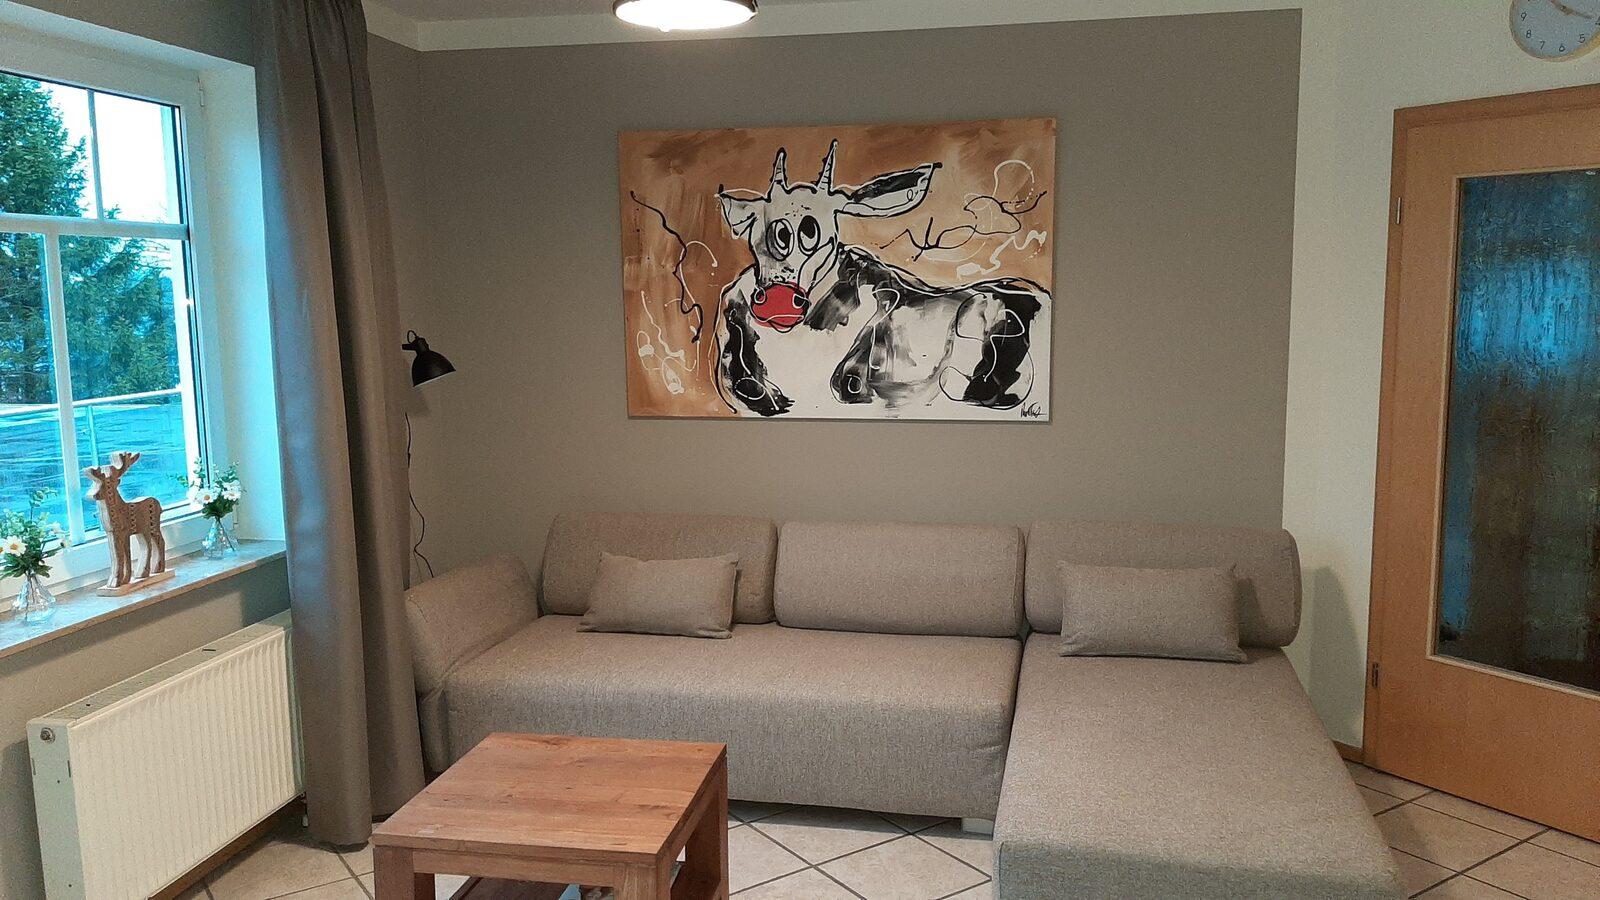 Appartement - Nuhnestrasse 2b   Winterberg - Adriana